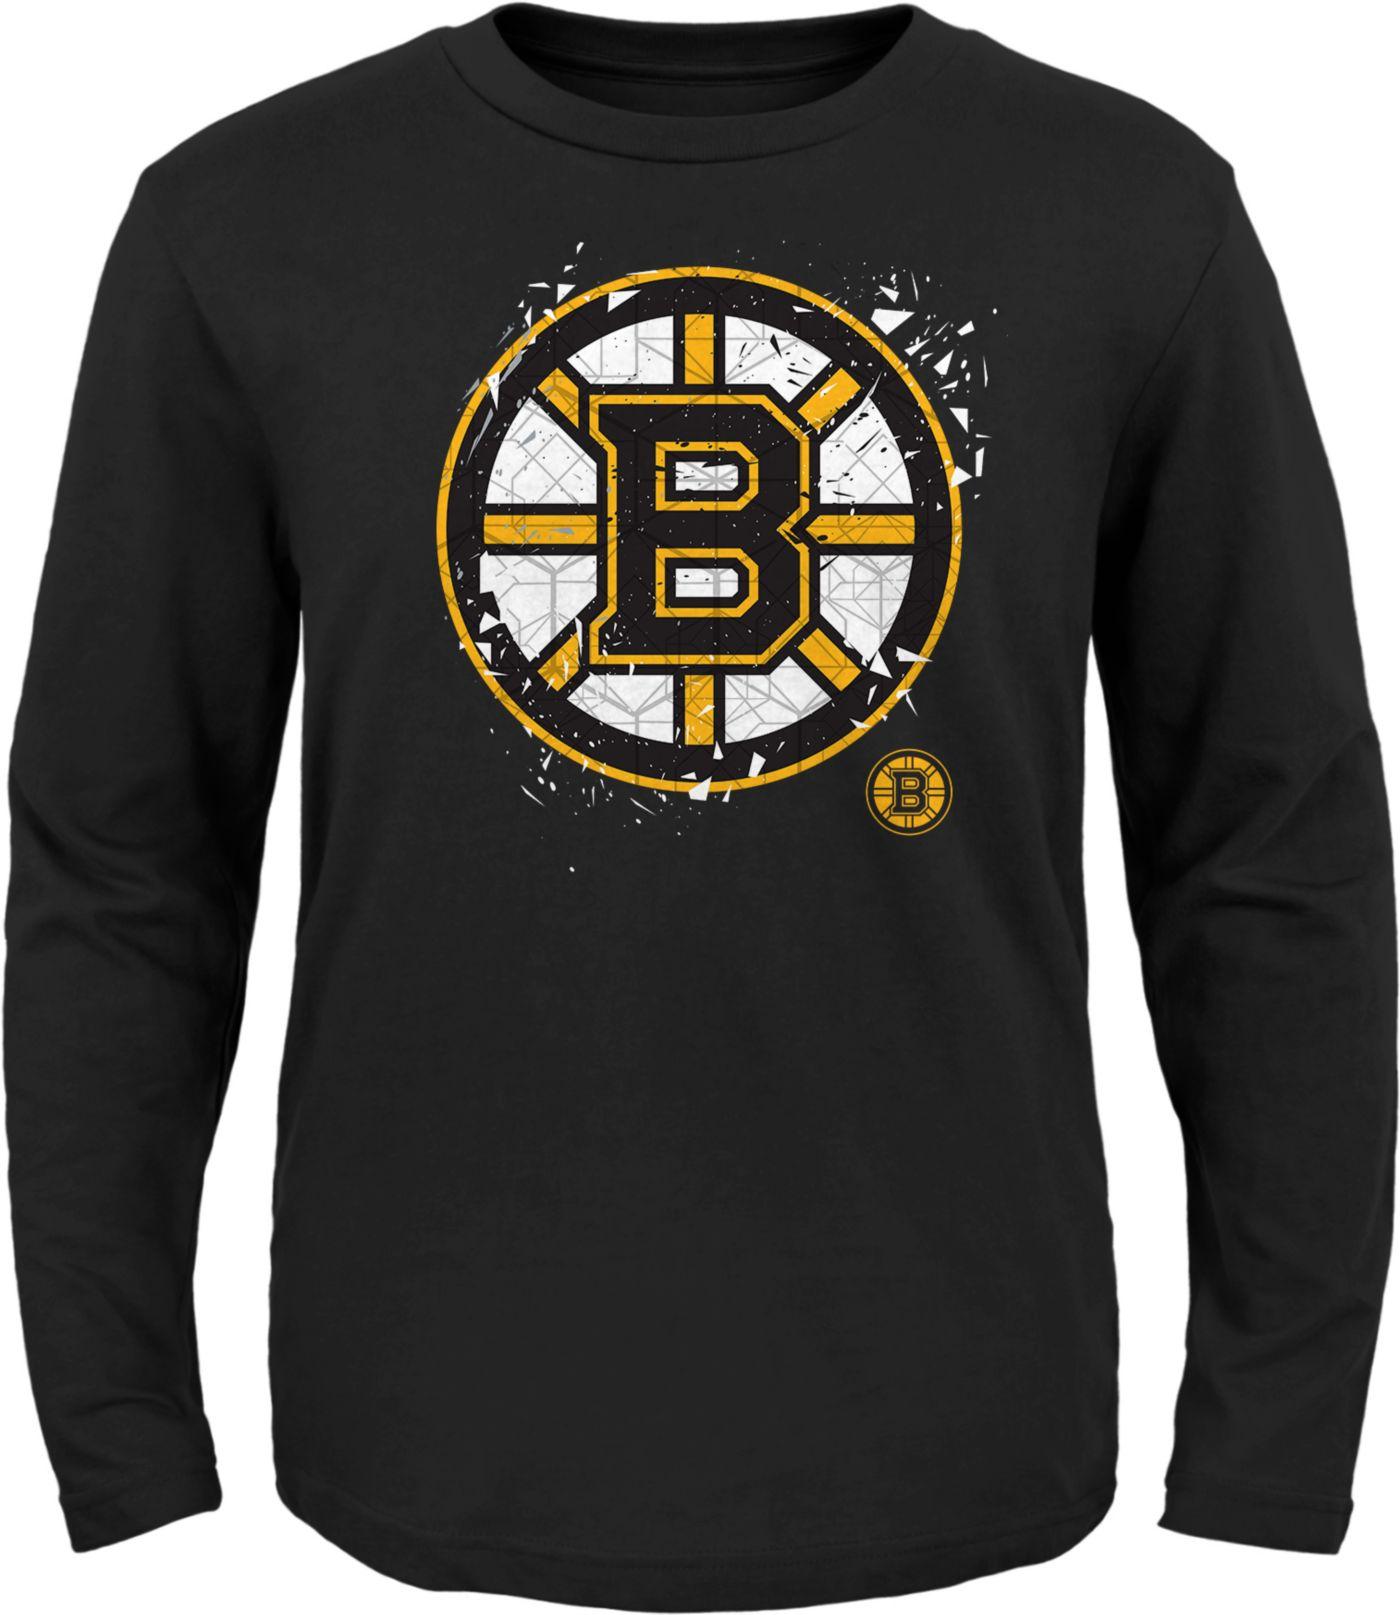 NHL Youth Boston Bruins Deconstructed Black Long Sleeve Shirt